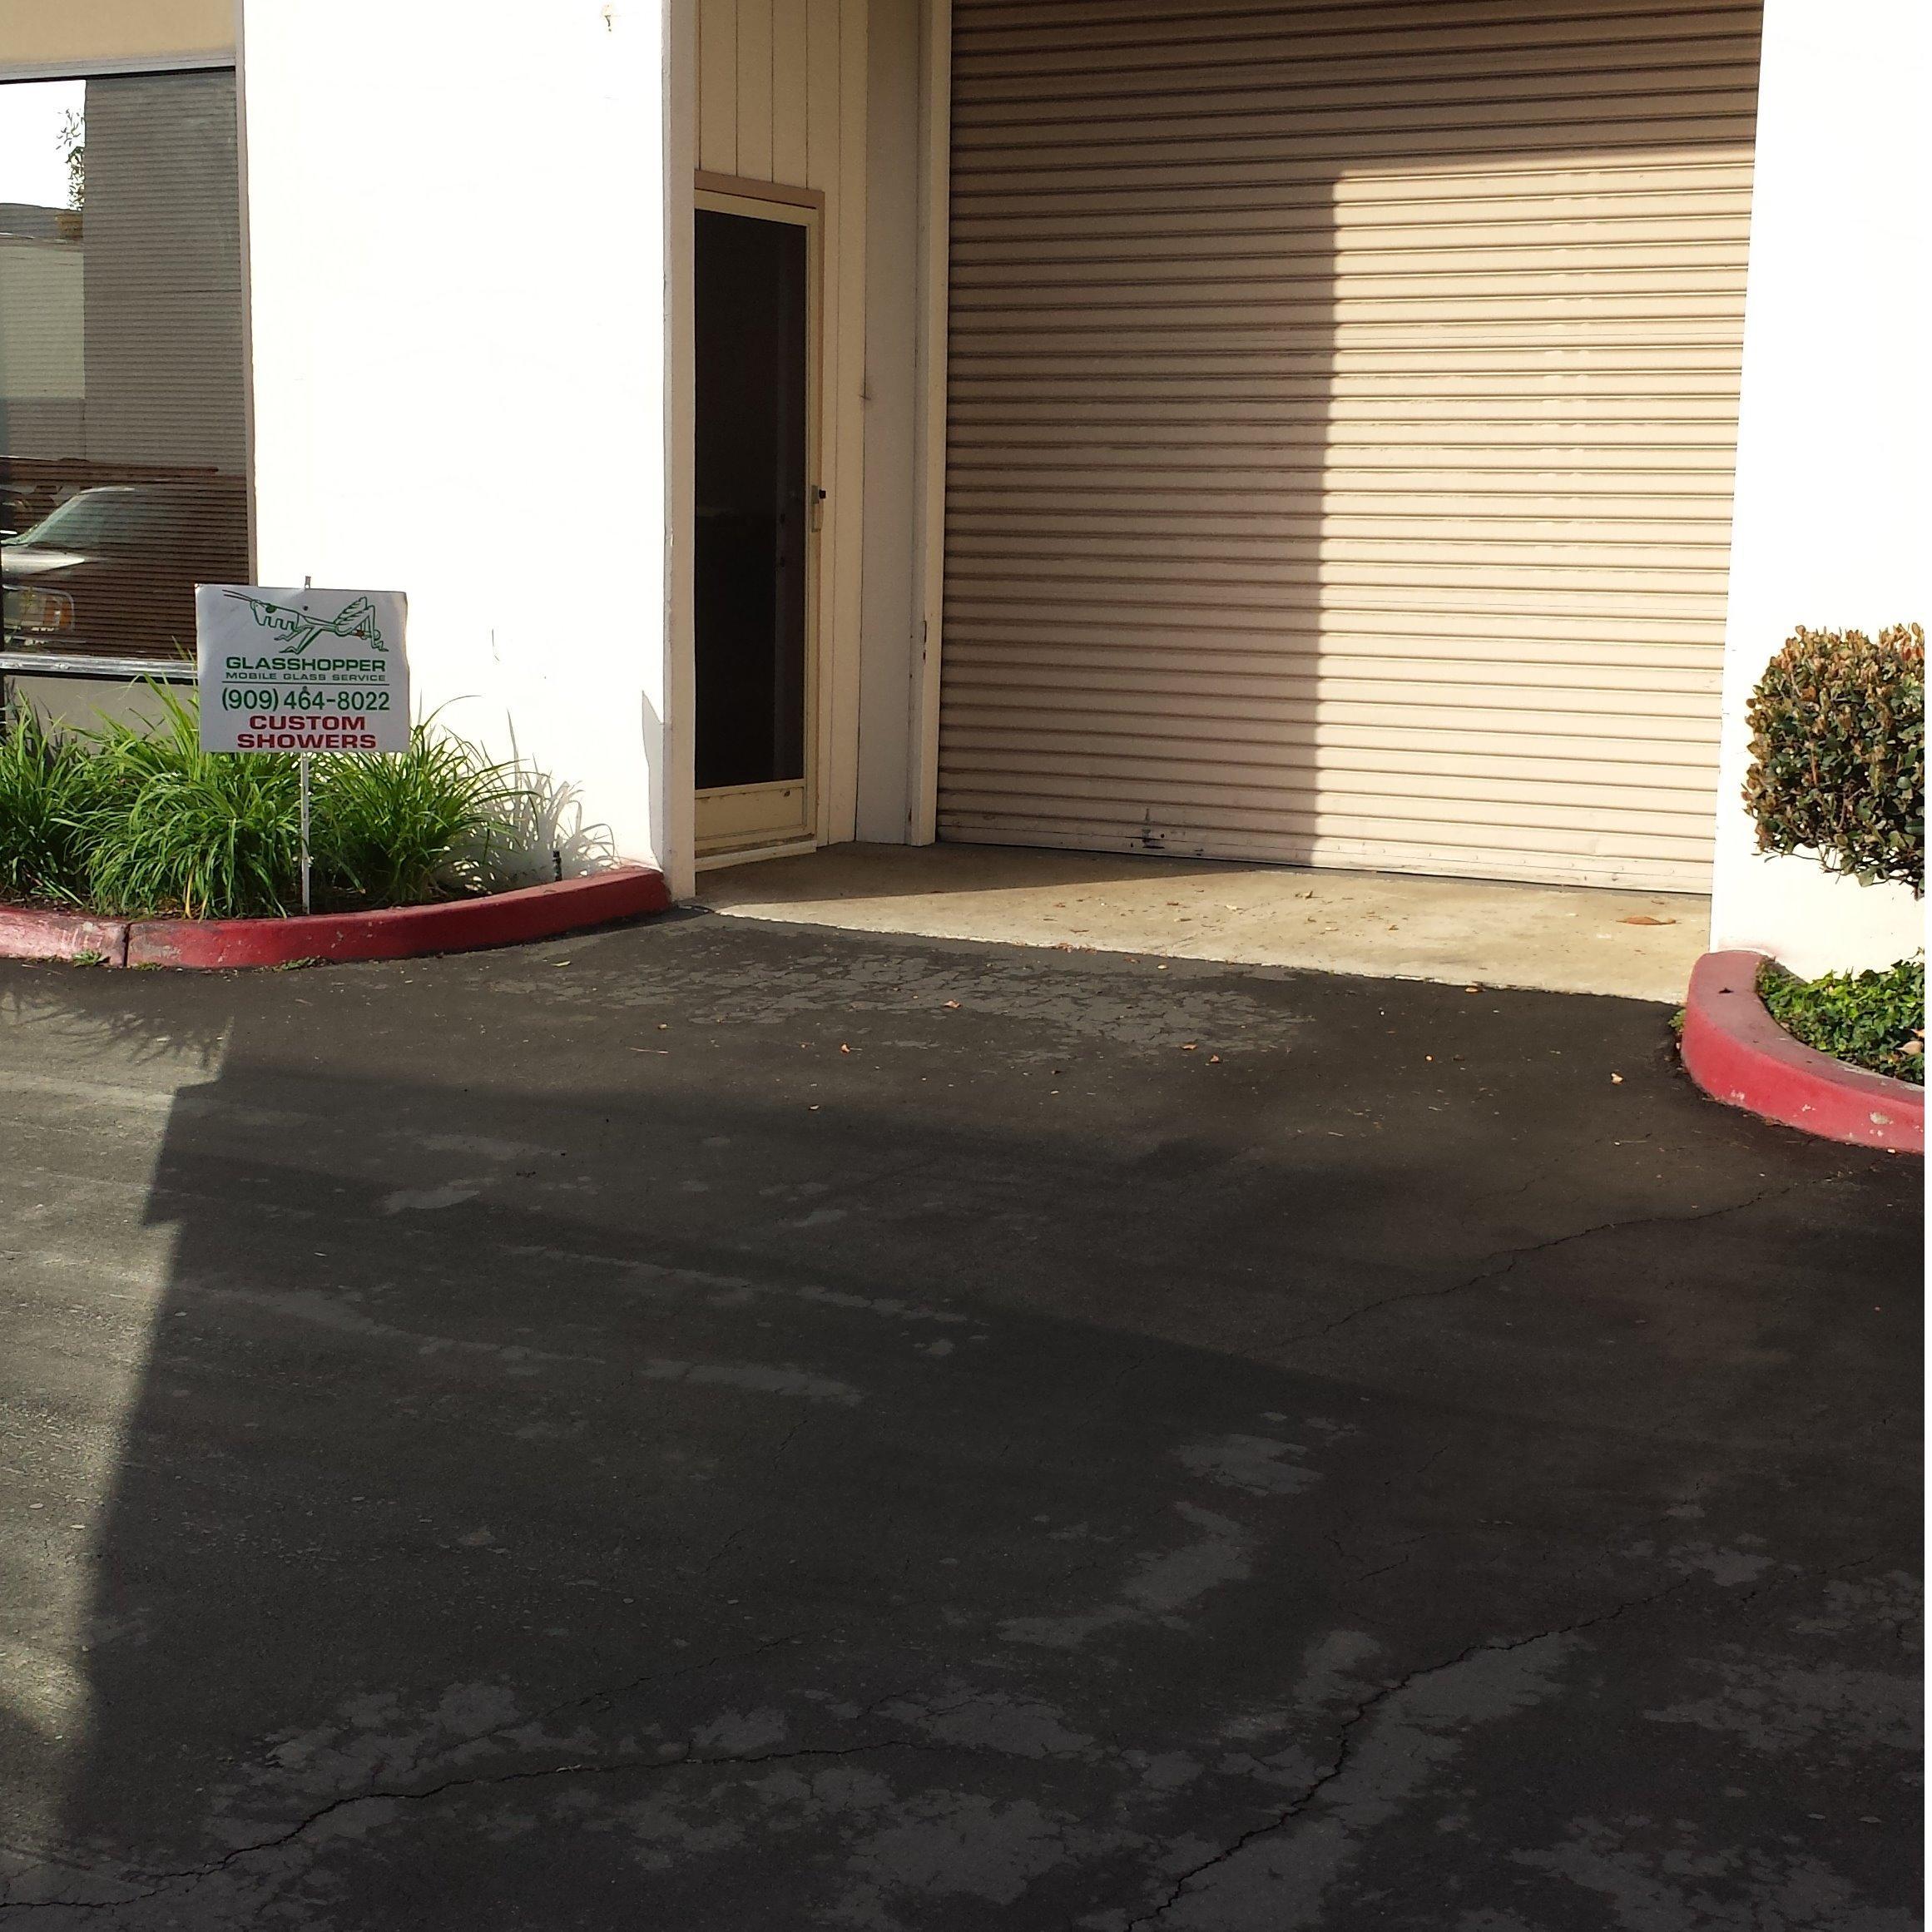 Glasshopper Glass Services - Chino, CA - Windows & Door Contractors